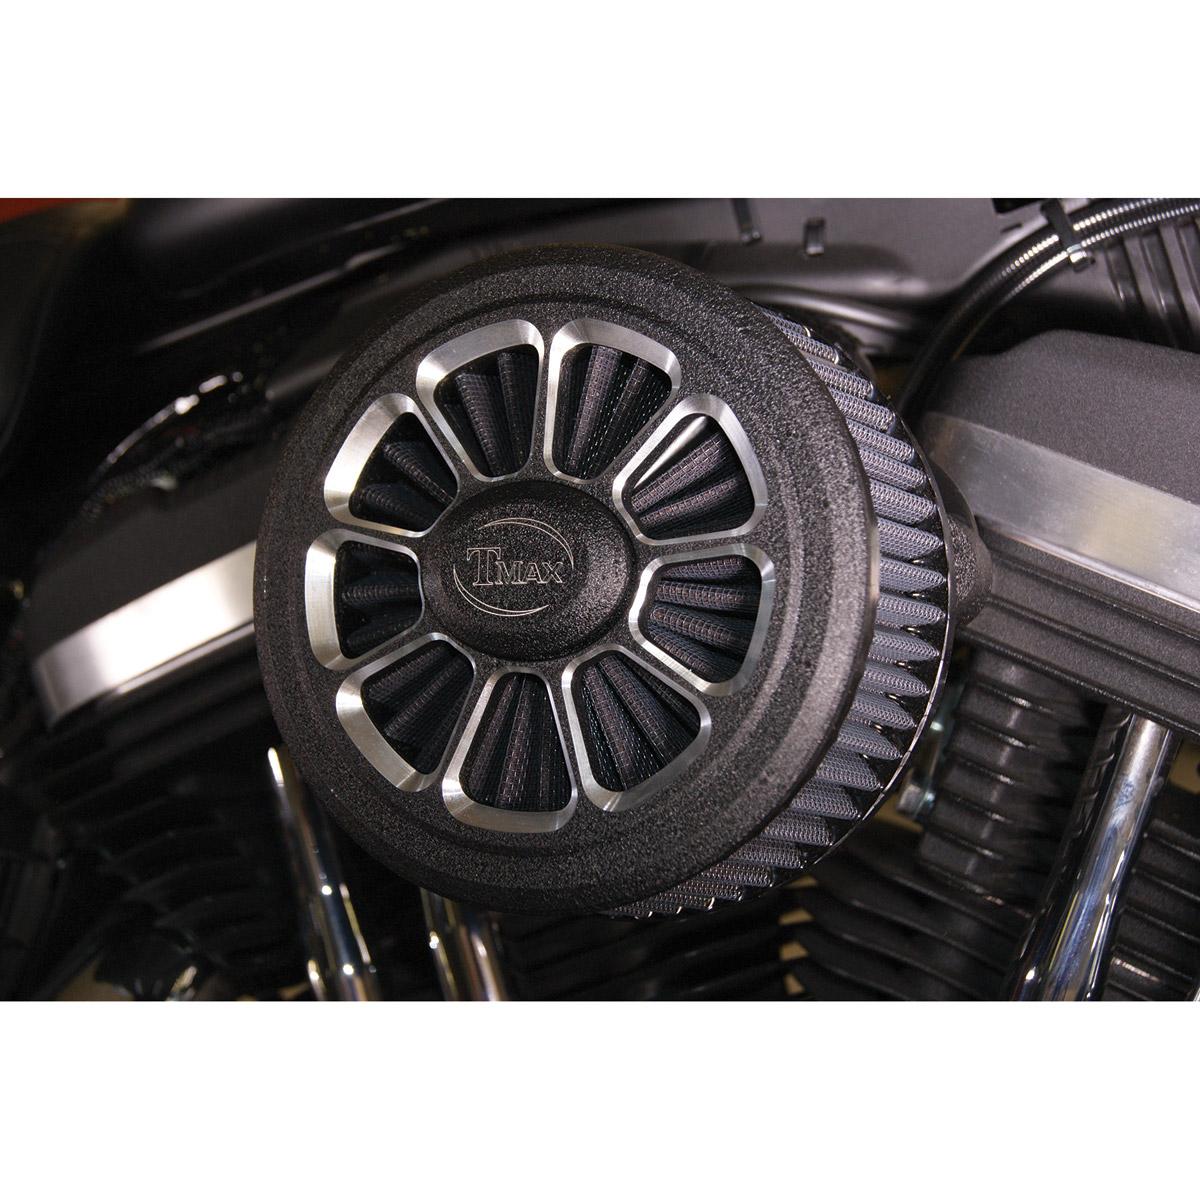 ThunderMax Ballistic 9 Spoke Contrast Cut Air Cleaner